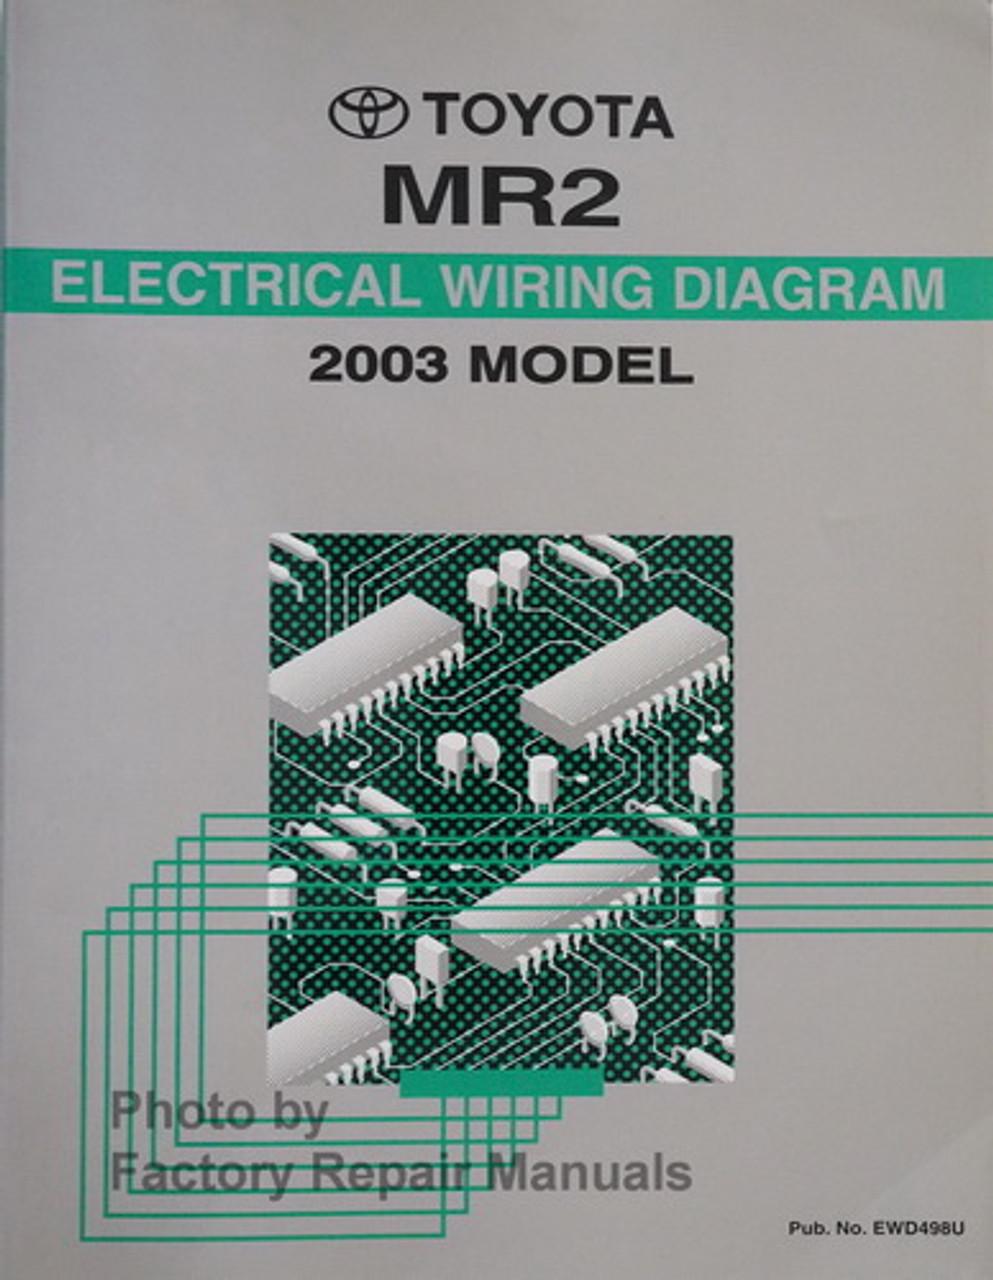 1974 buick apollo wiring diagram 2003 toyota mr2 spyder electrical wiring diagrams original manual  2003 toyota mr2 spyder electrical